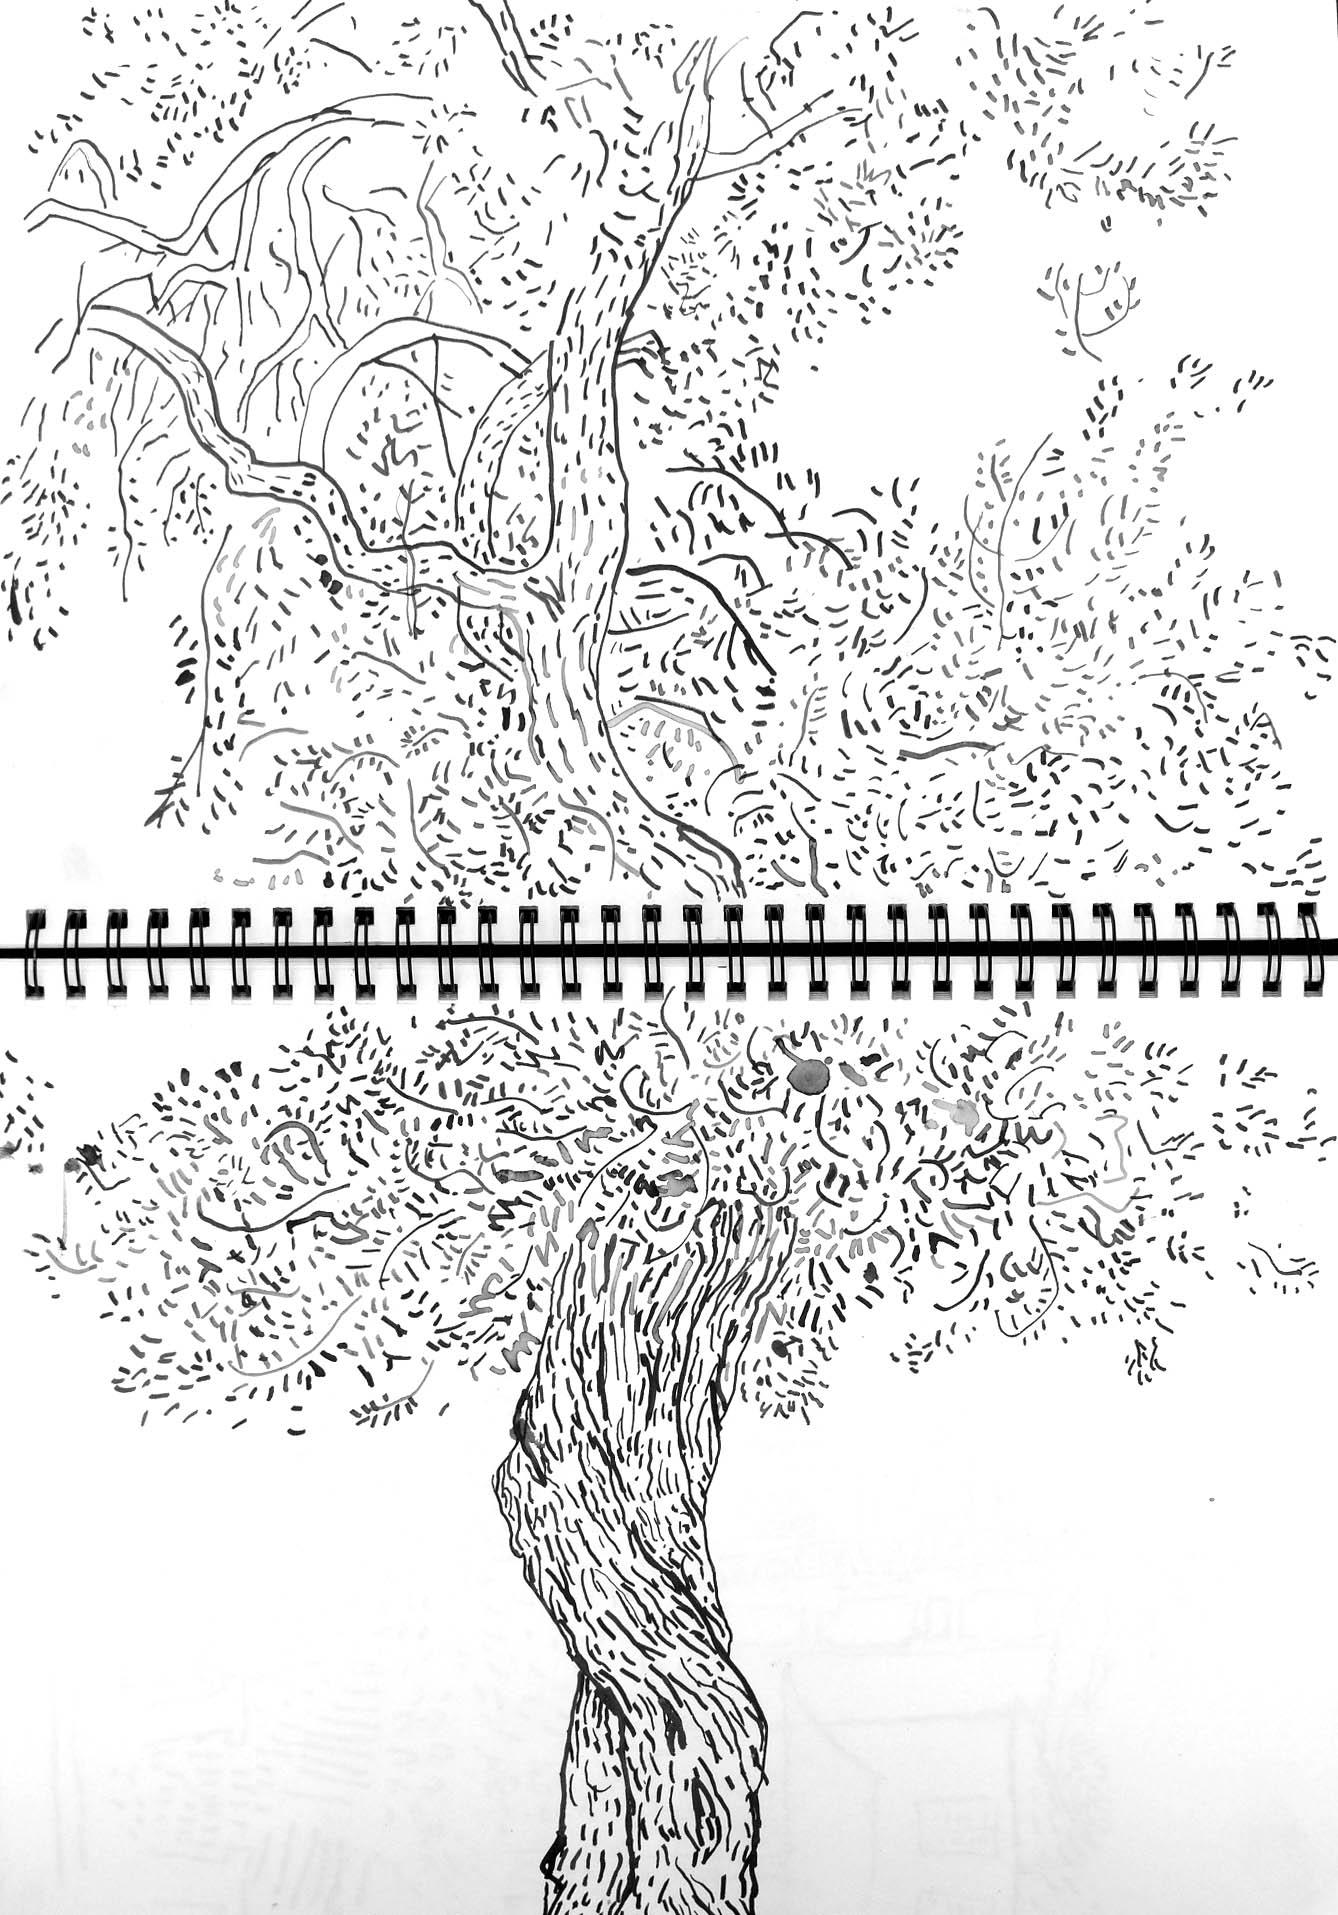 olivier6